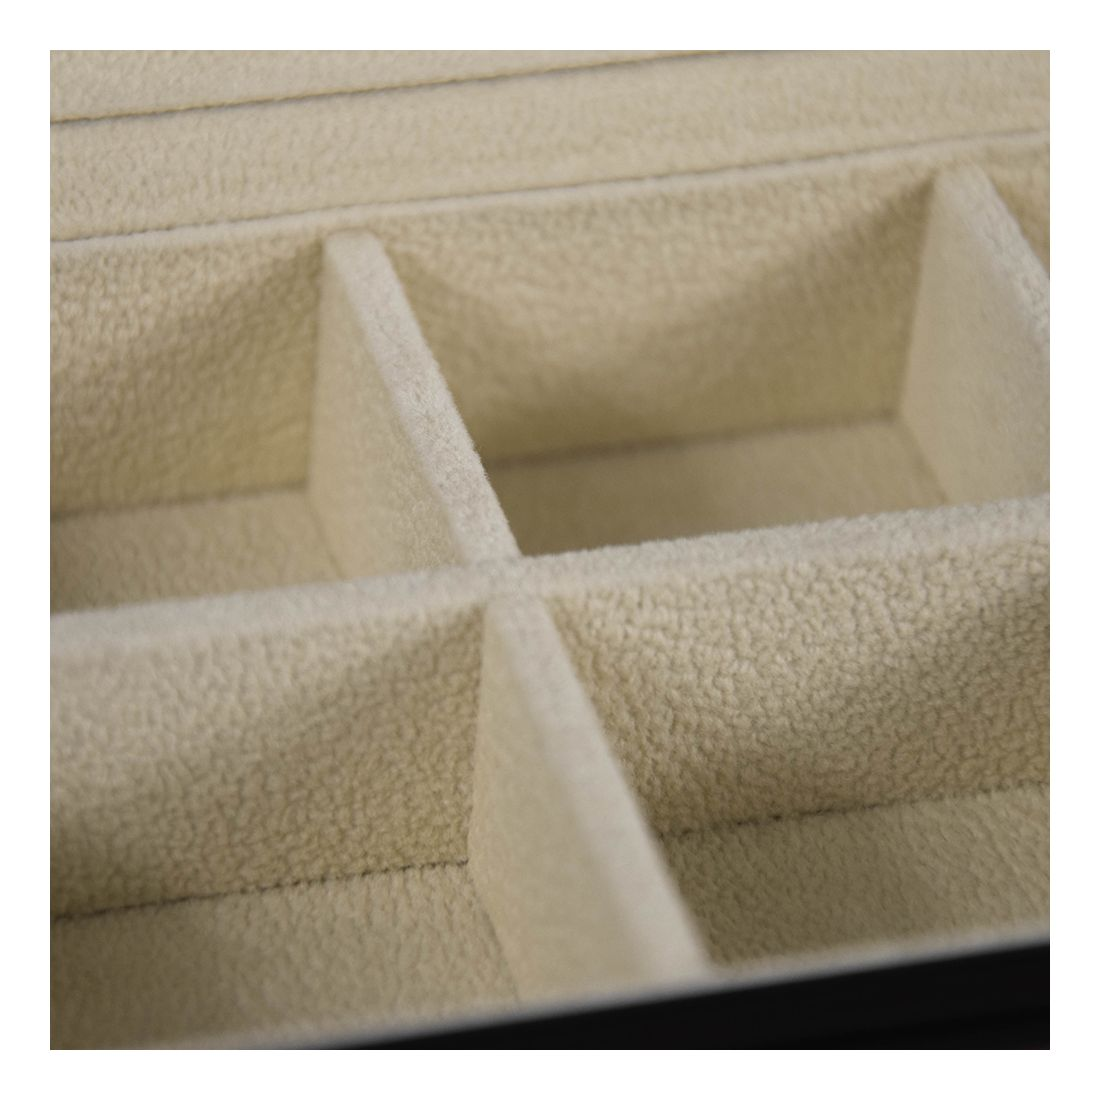 ecrin luxe bois 8 boutons de manchette kennett bois noeud brillant. Black Bedroom Furniture Sets. Home Design Ideas